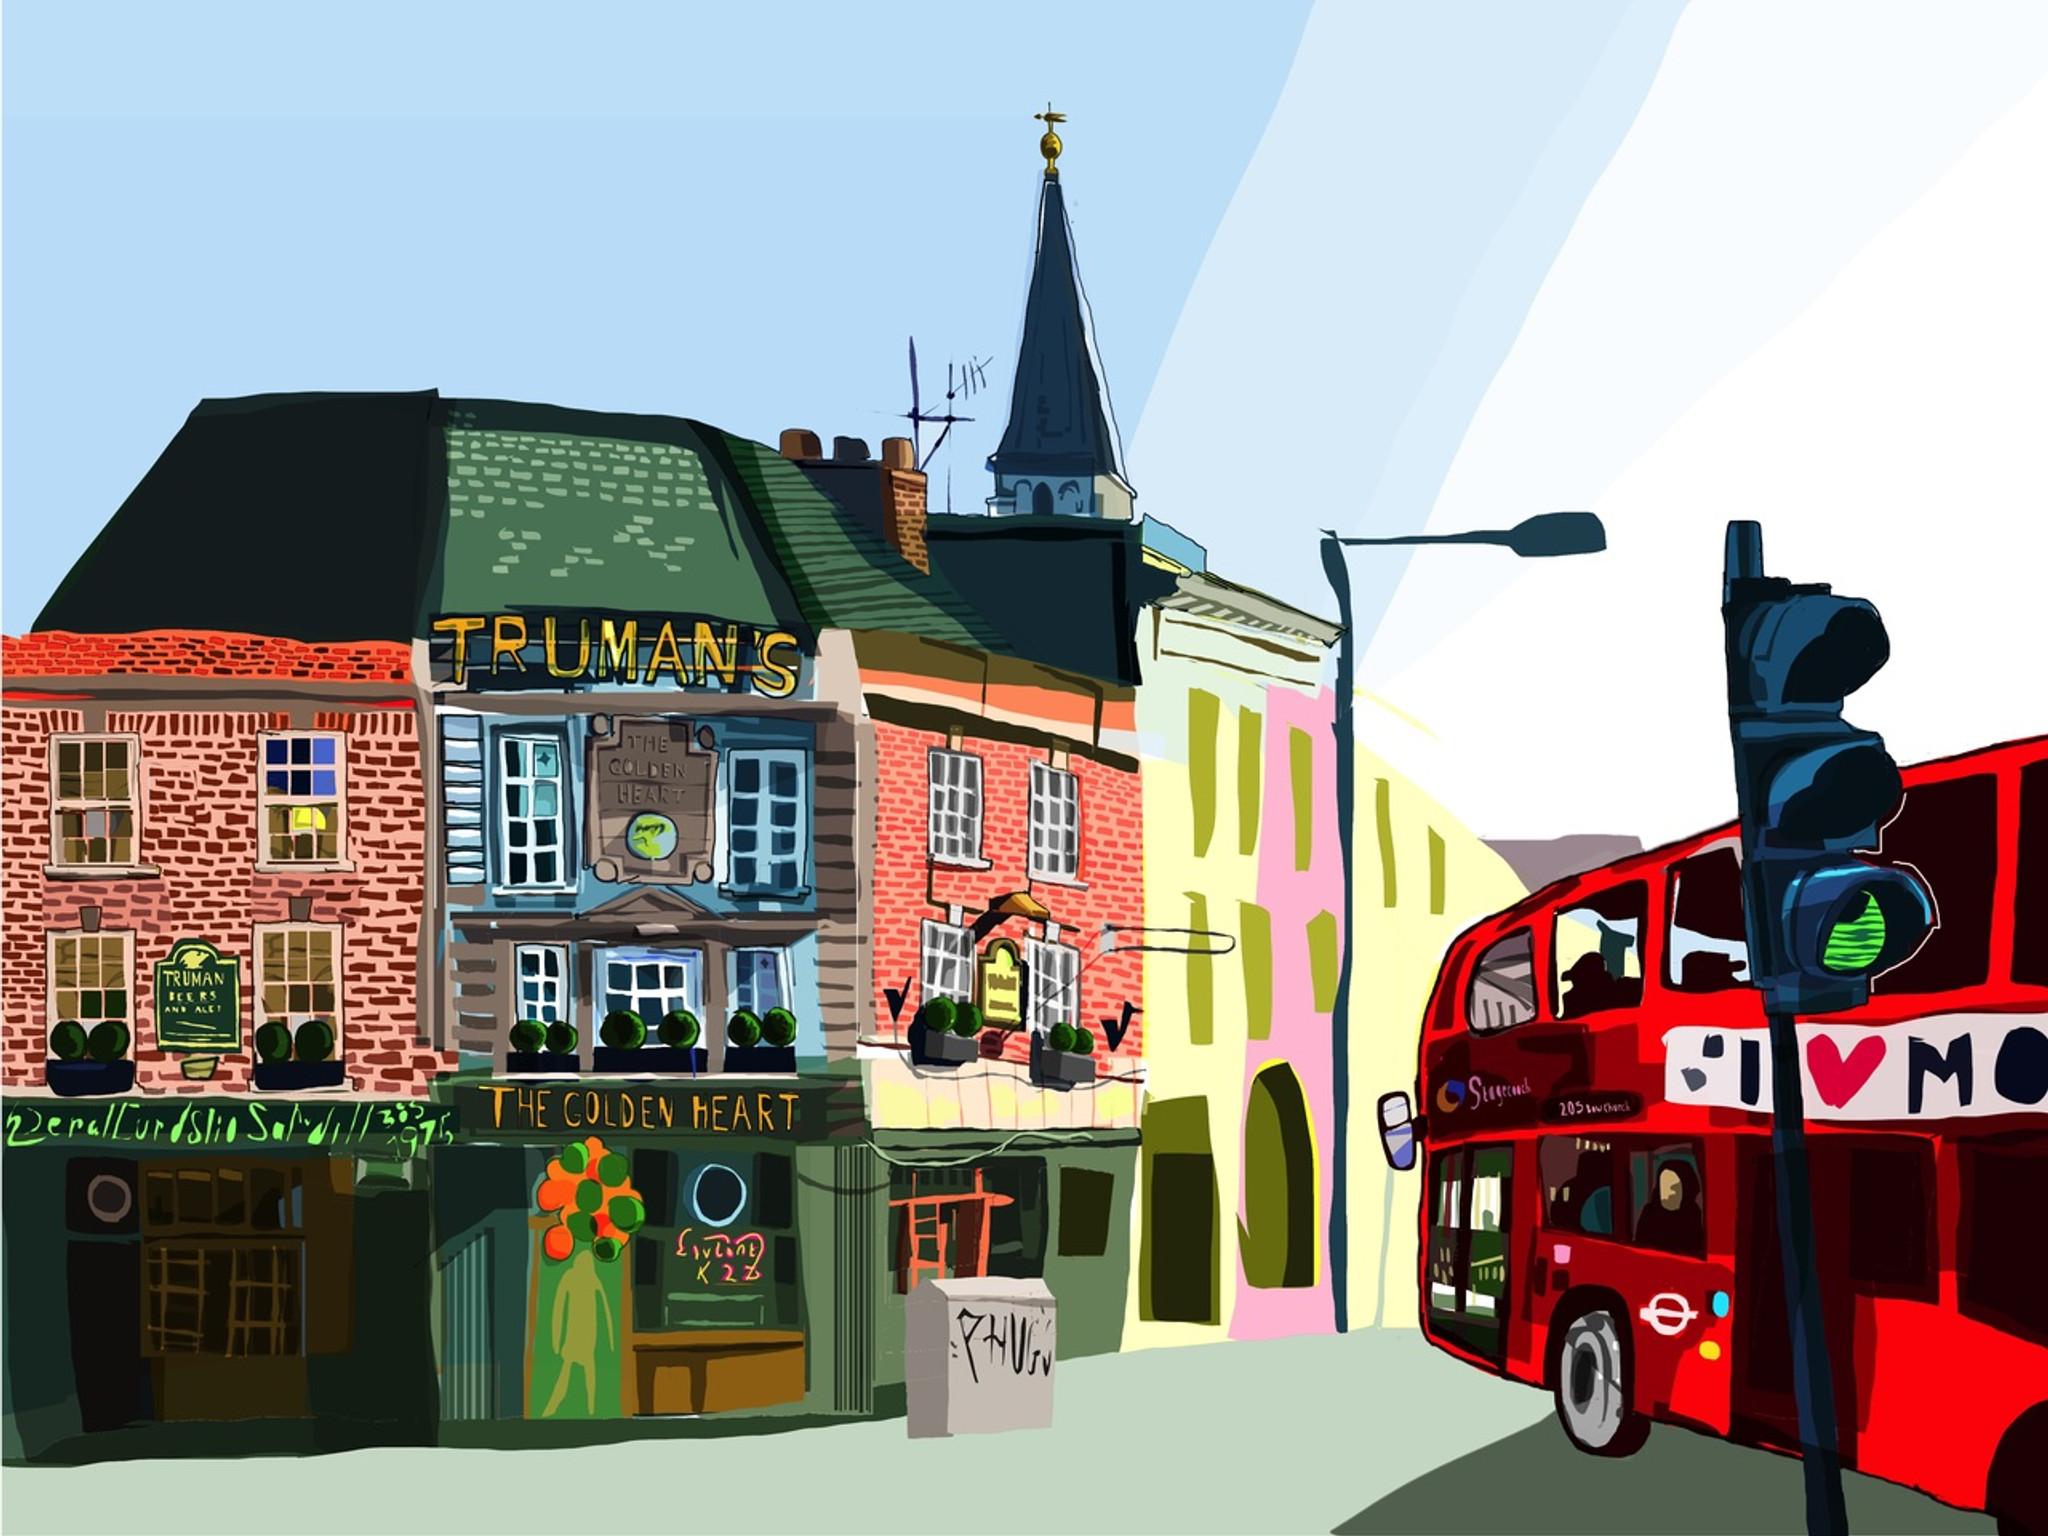 The Golden Heart Pub